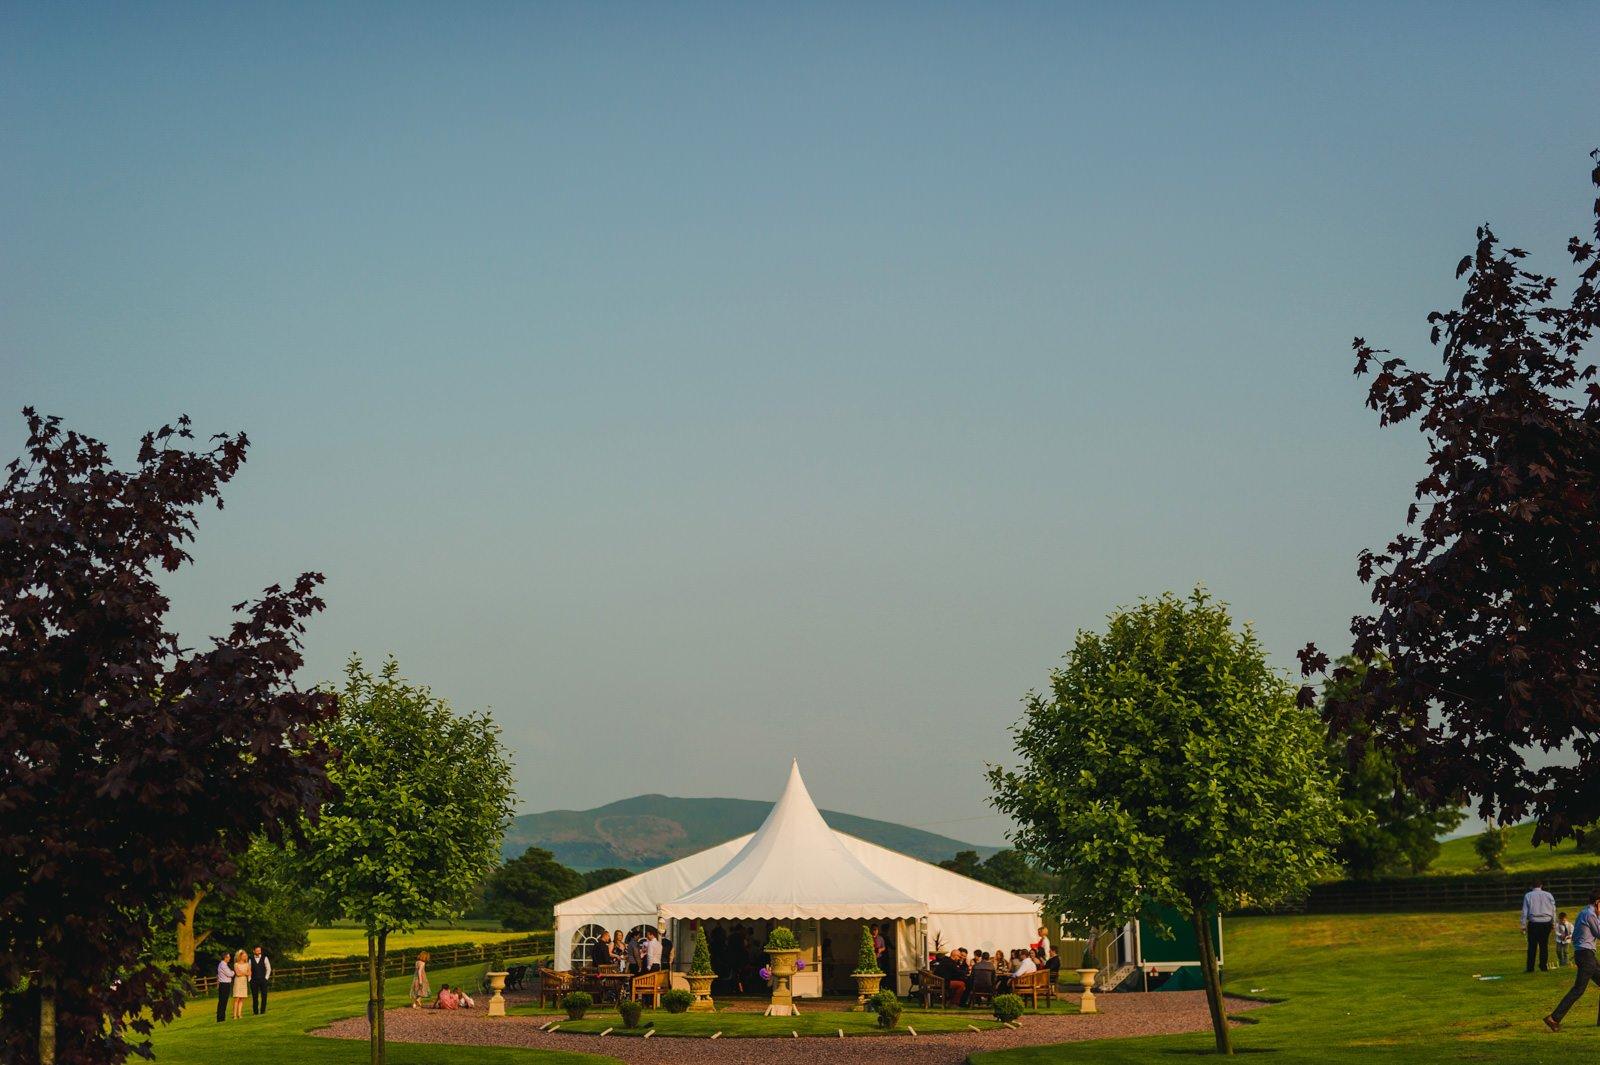 Millers Of Netley wedding, Dorrington, Shrewsbury | Emma + Ben 77